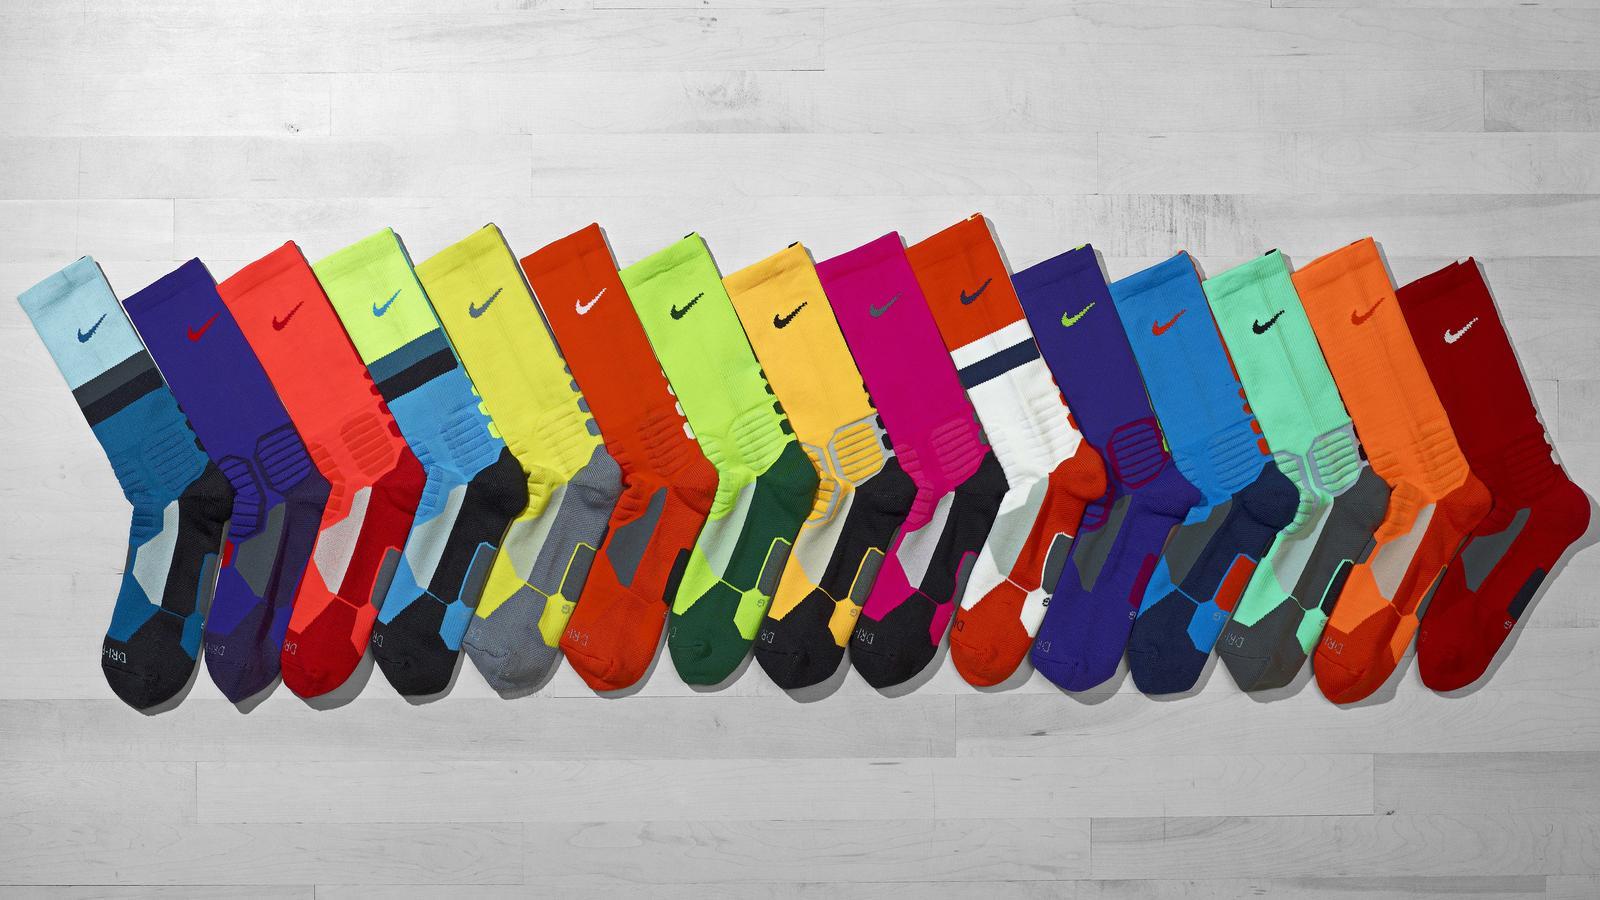 f94f3f670 hyperelite_socks_2. hyperelite_socks_3. hyperelite_socks_4. hyperelite-sock-techsheet-final-01.  hyperelite_socks_1